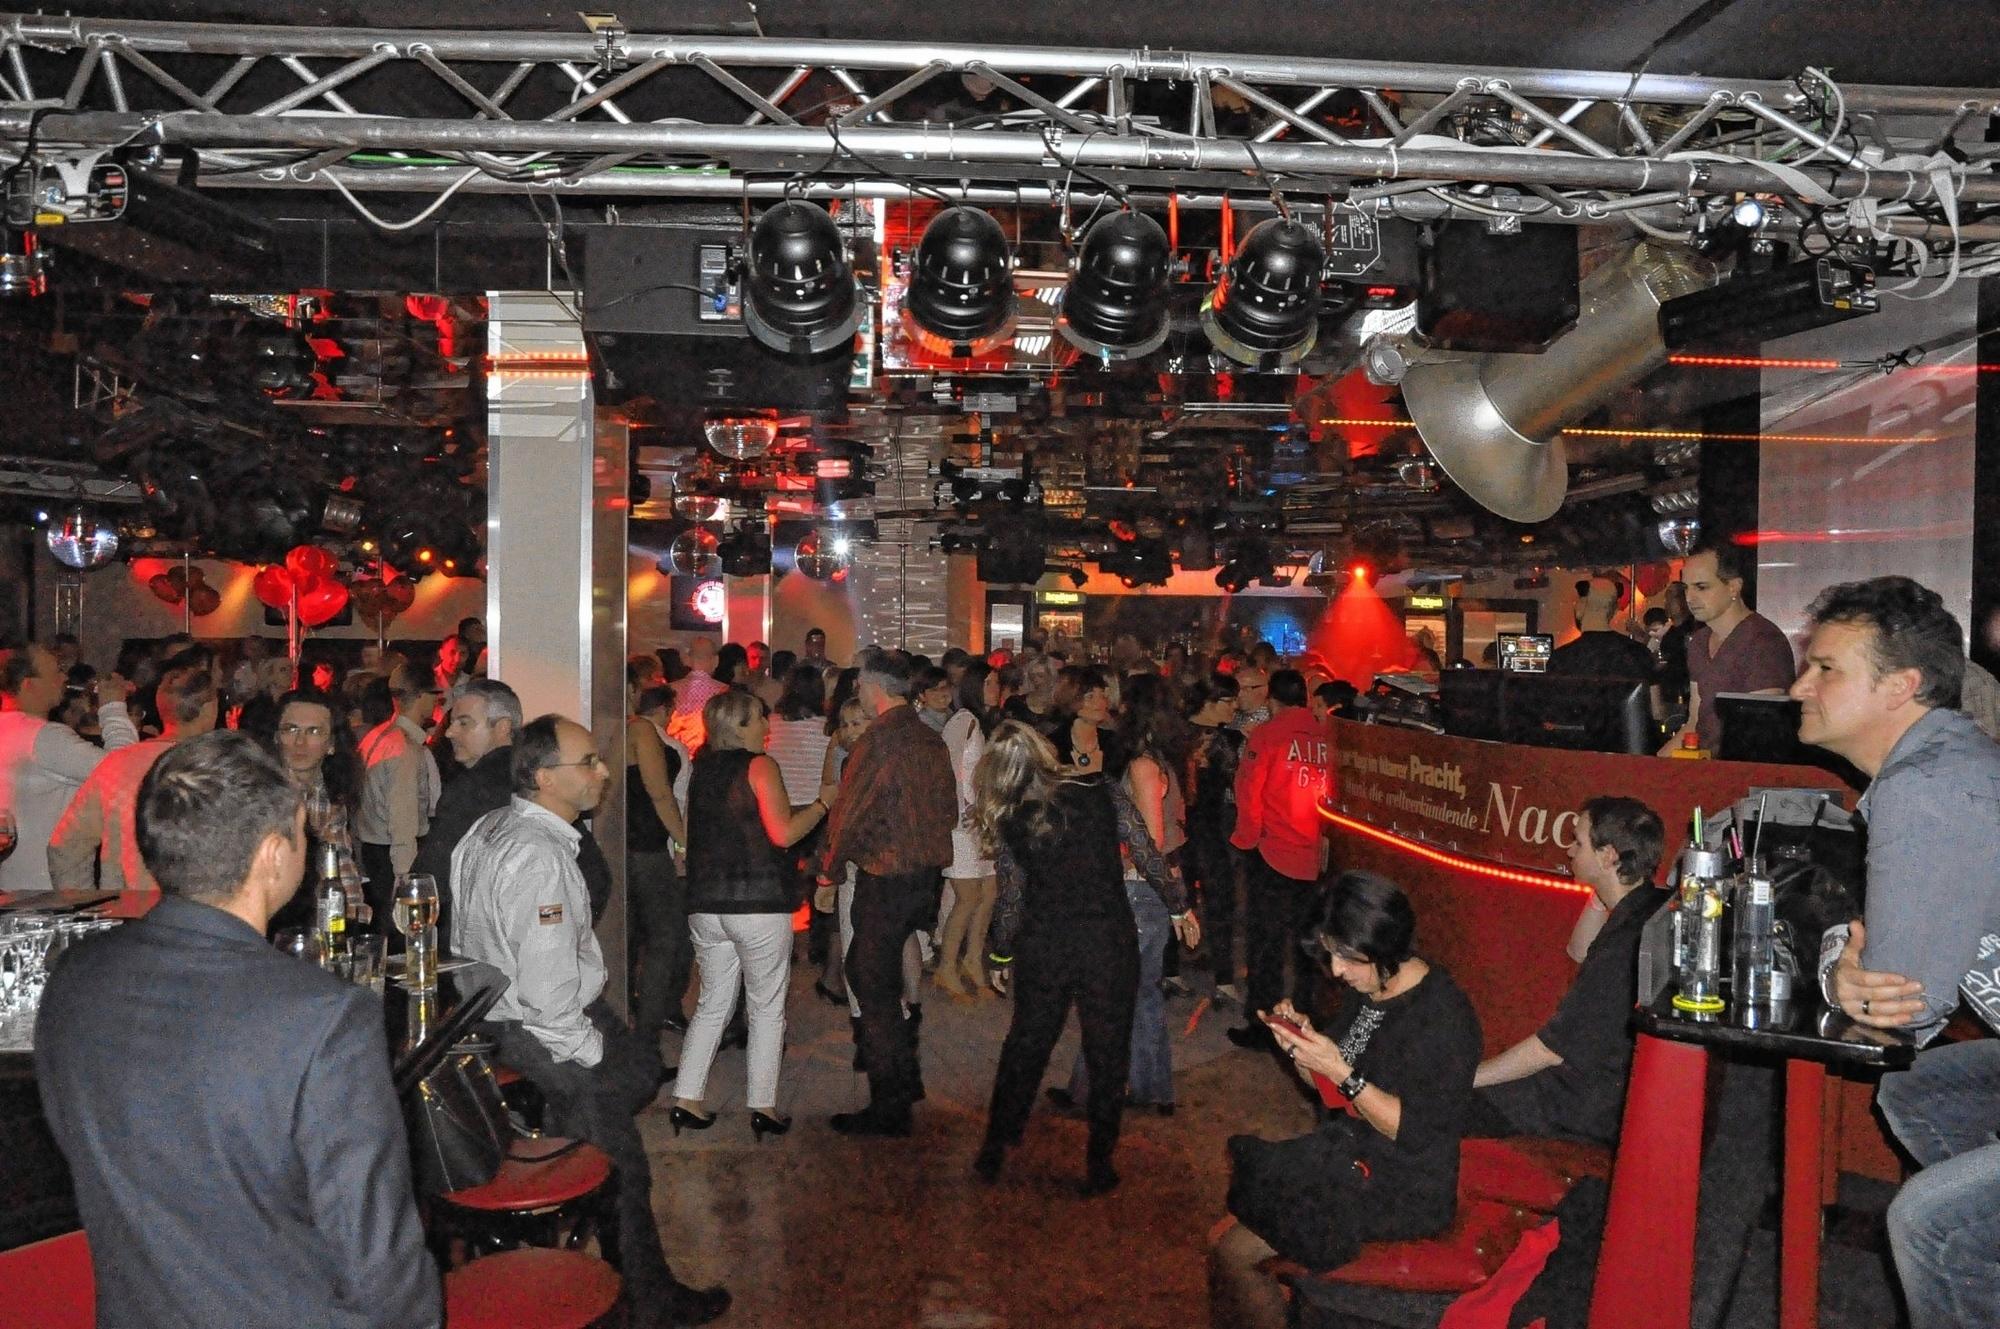 nrw single party Emden